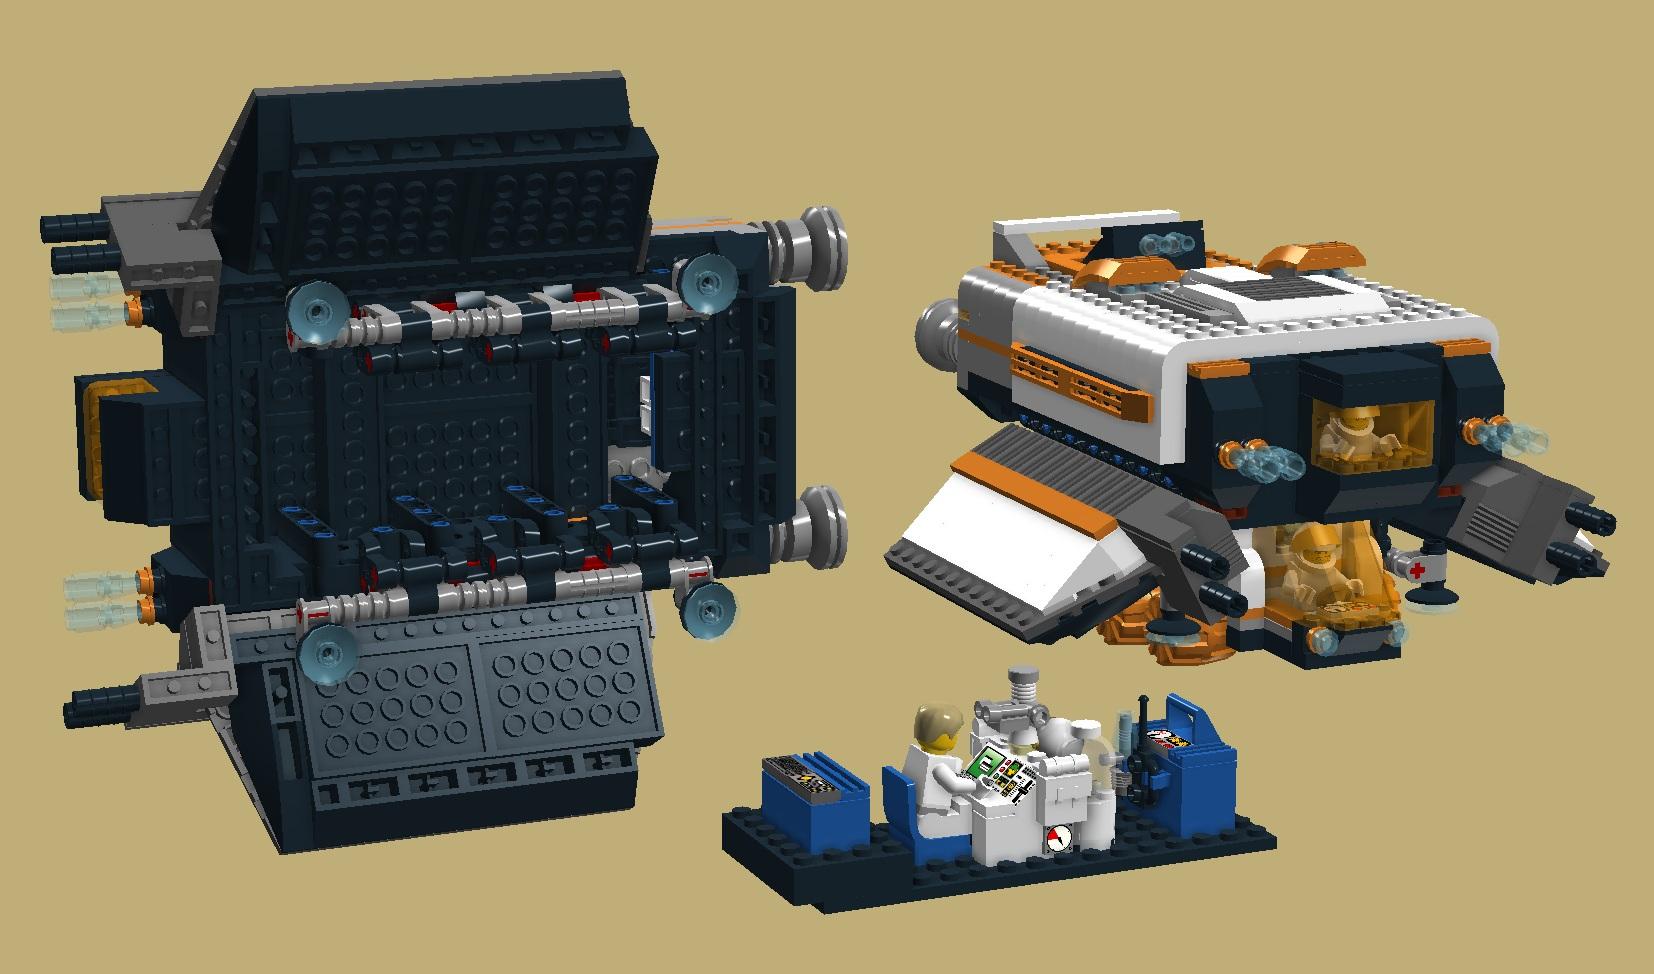 space engineers mars rover - photo #32